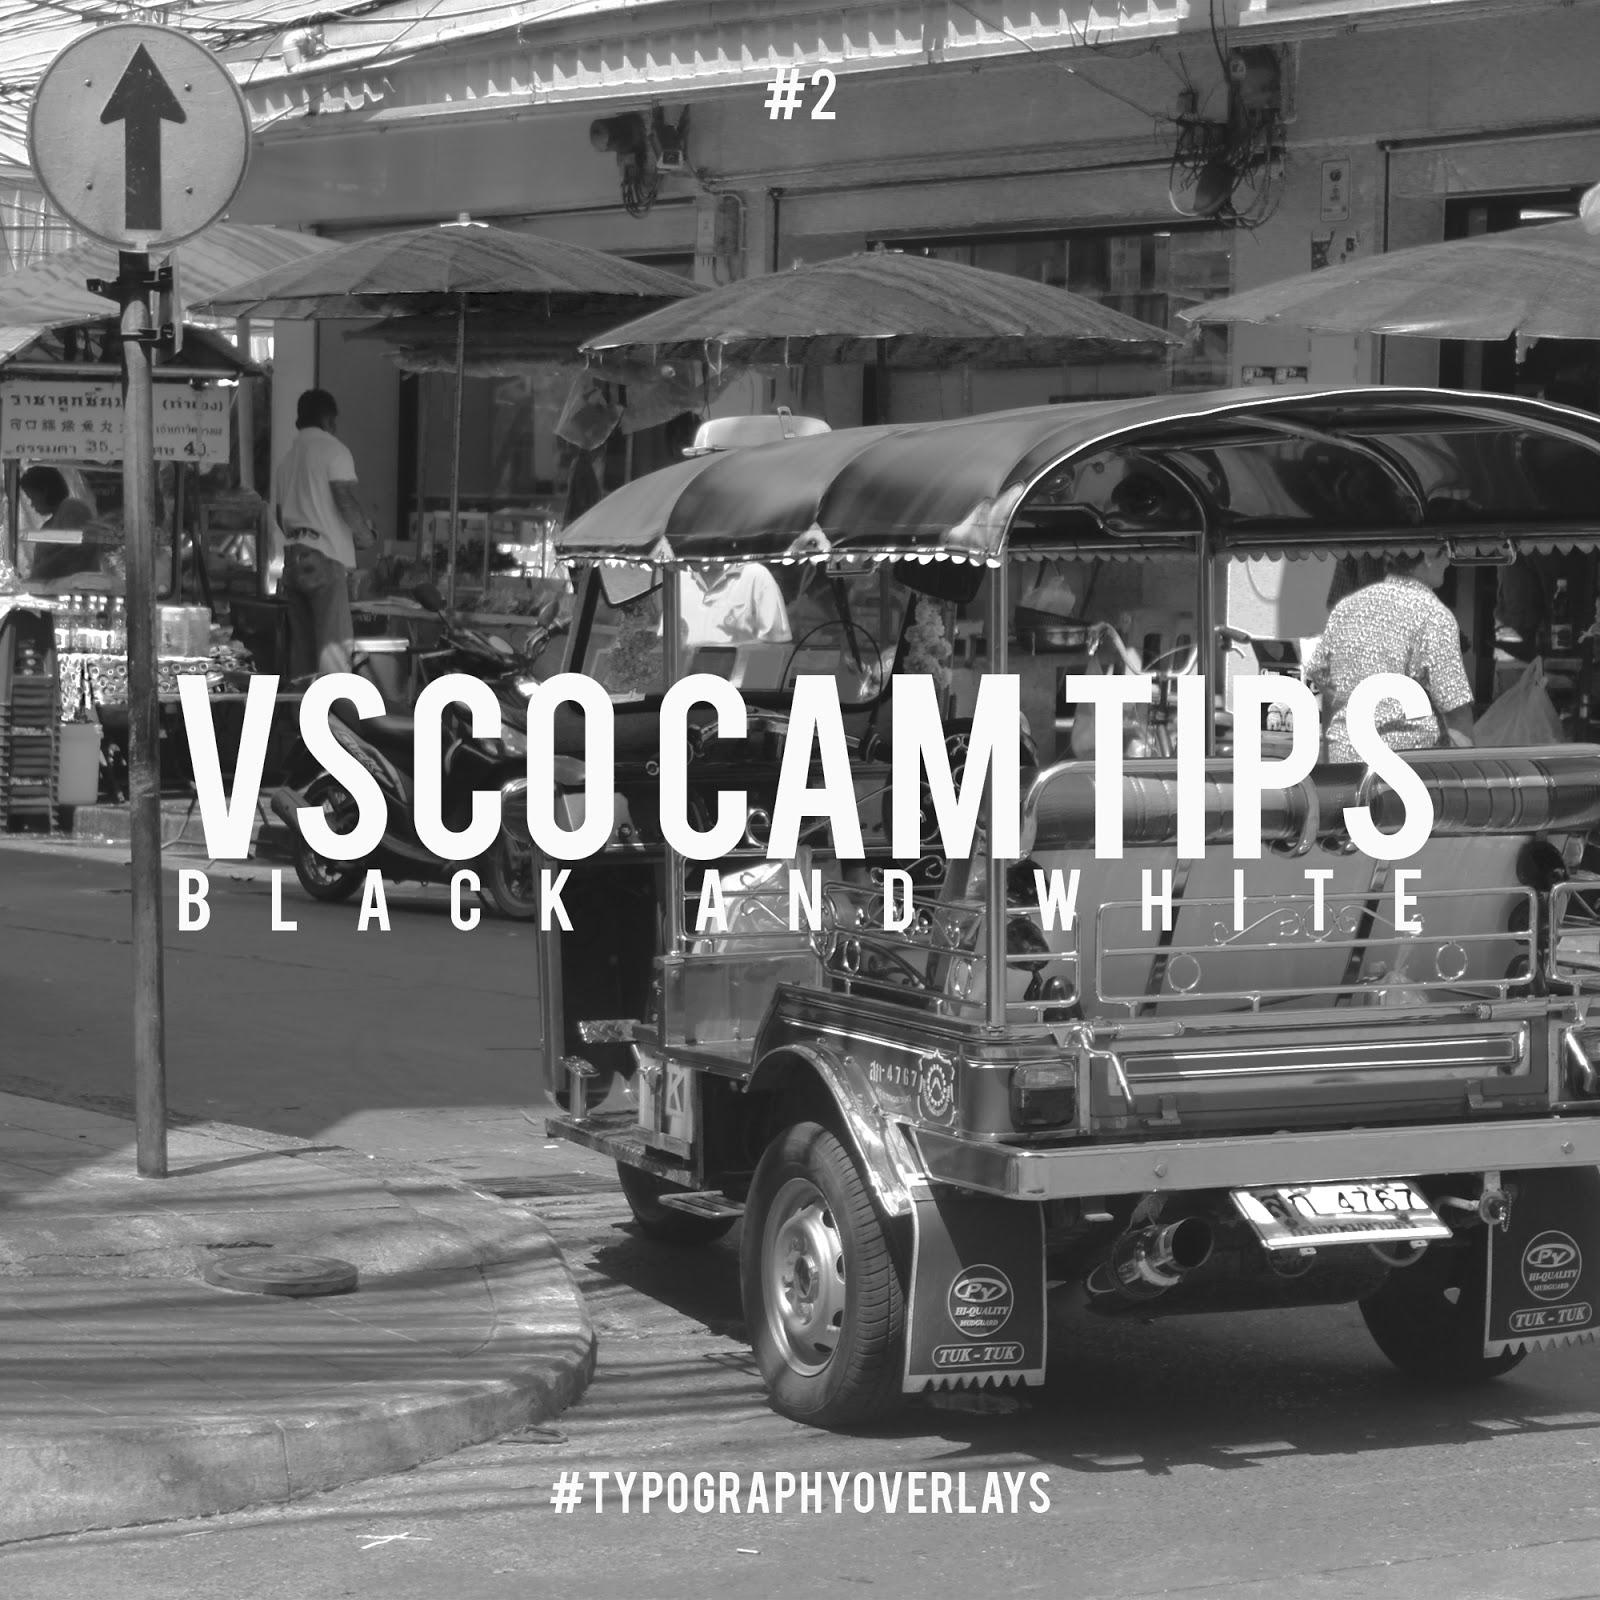 vsco cam filters tips case mobile